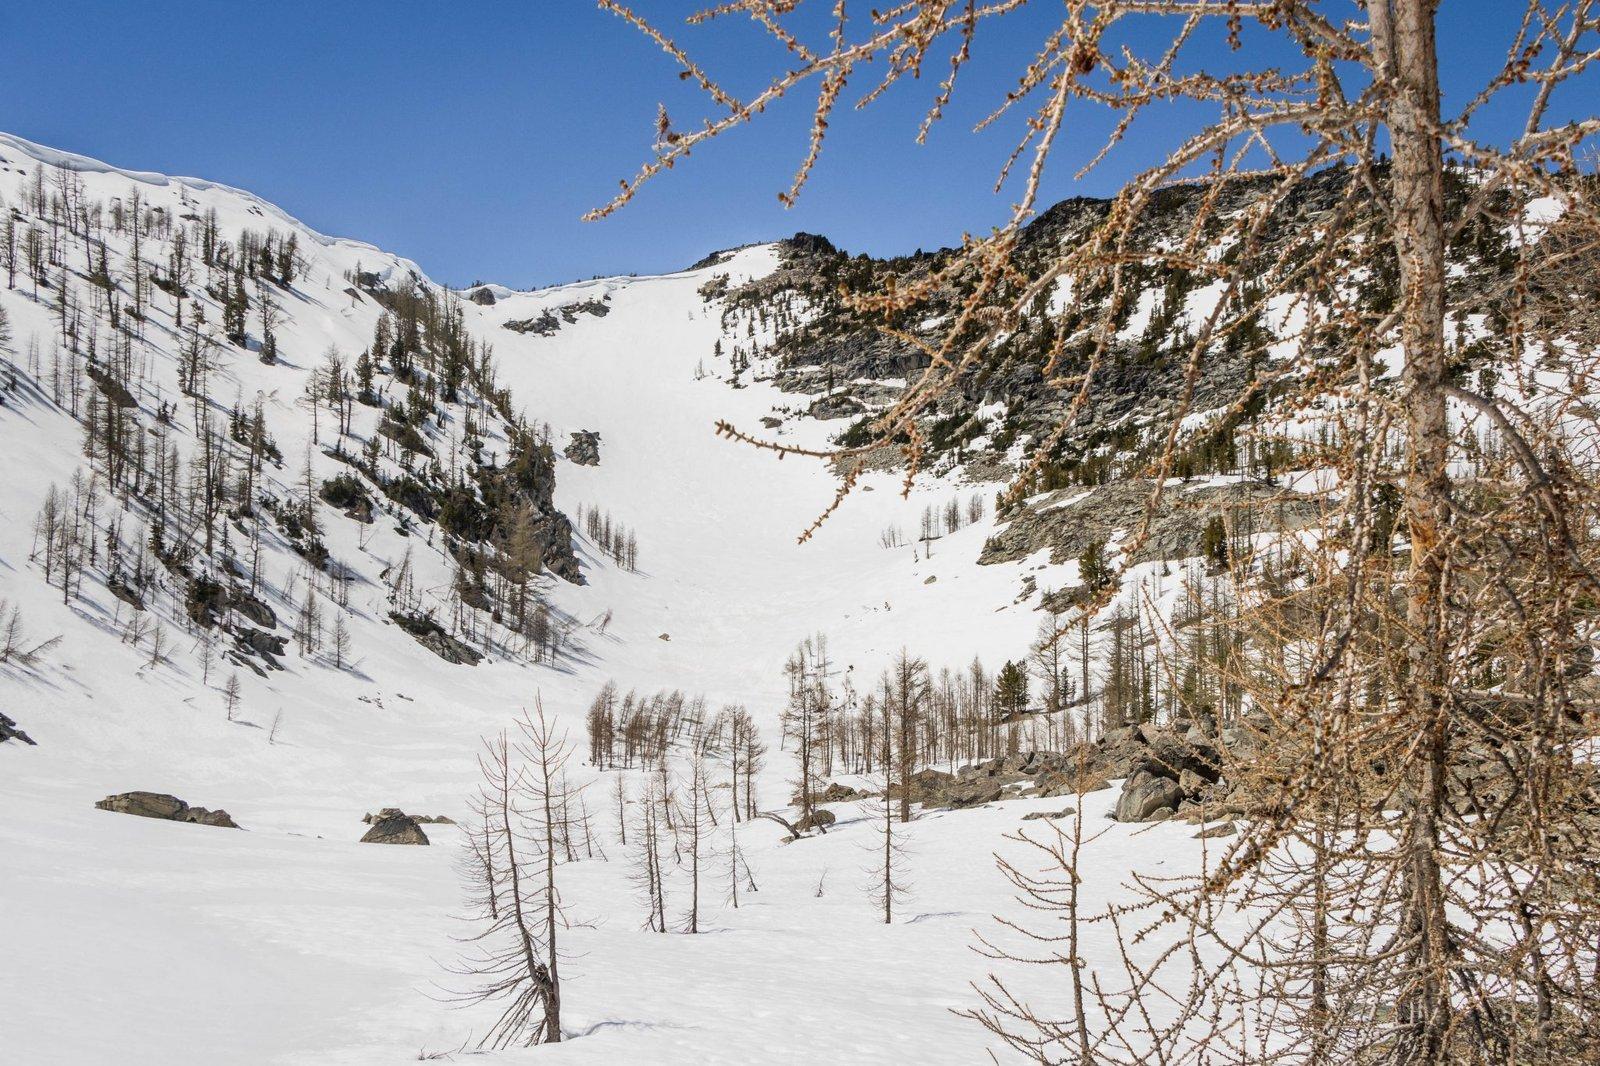 The unimpressive side of Rennie Peak